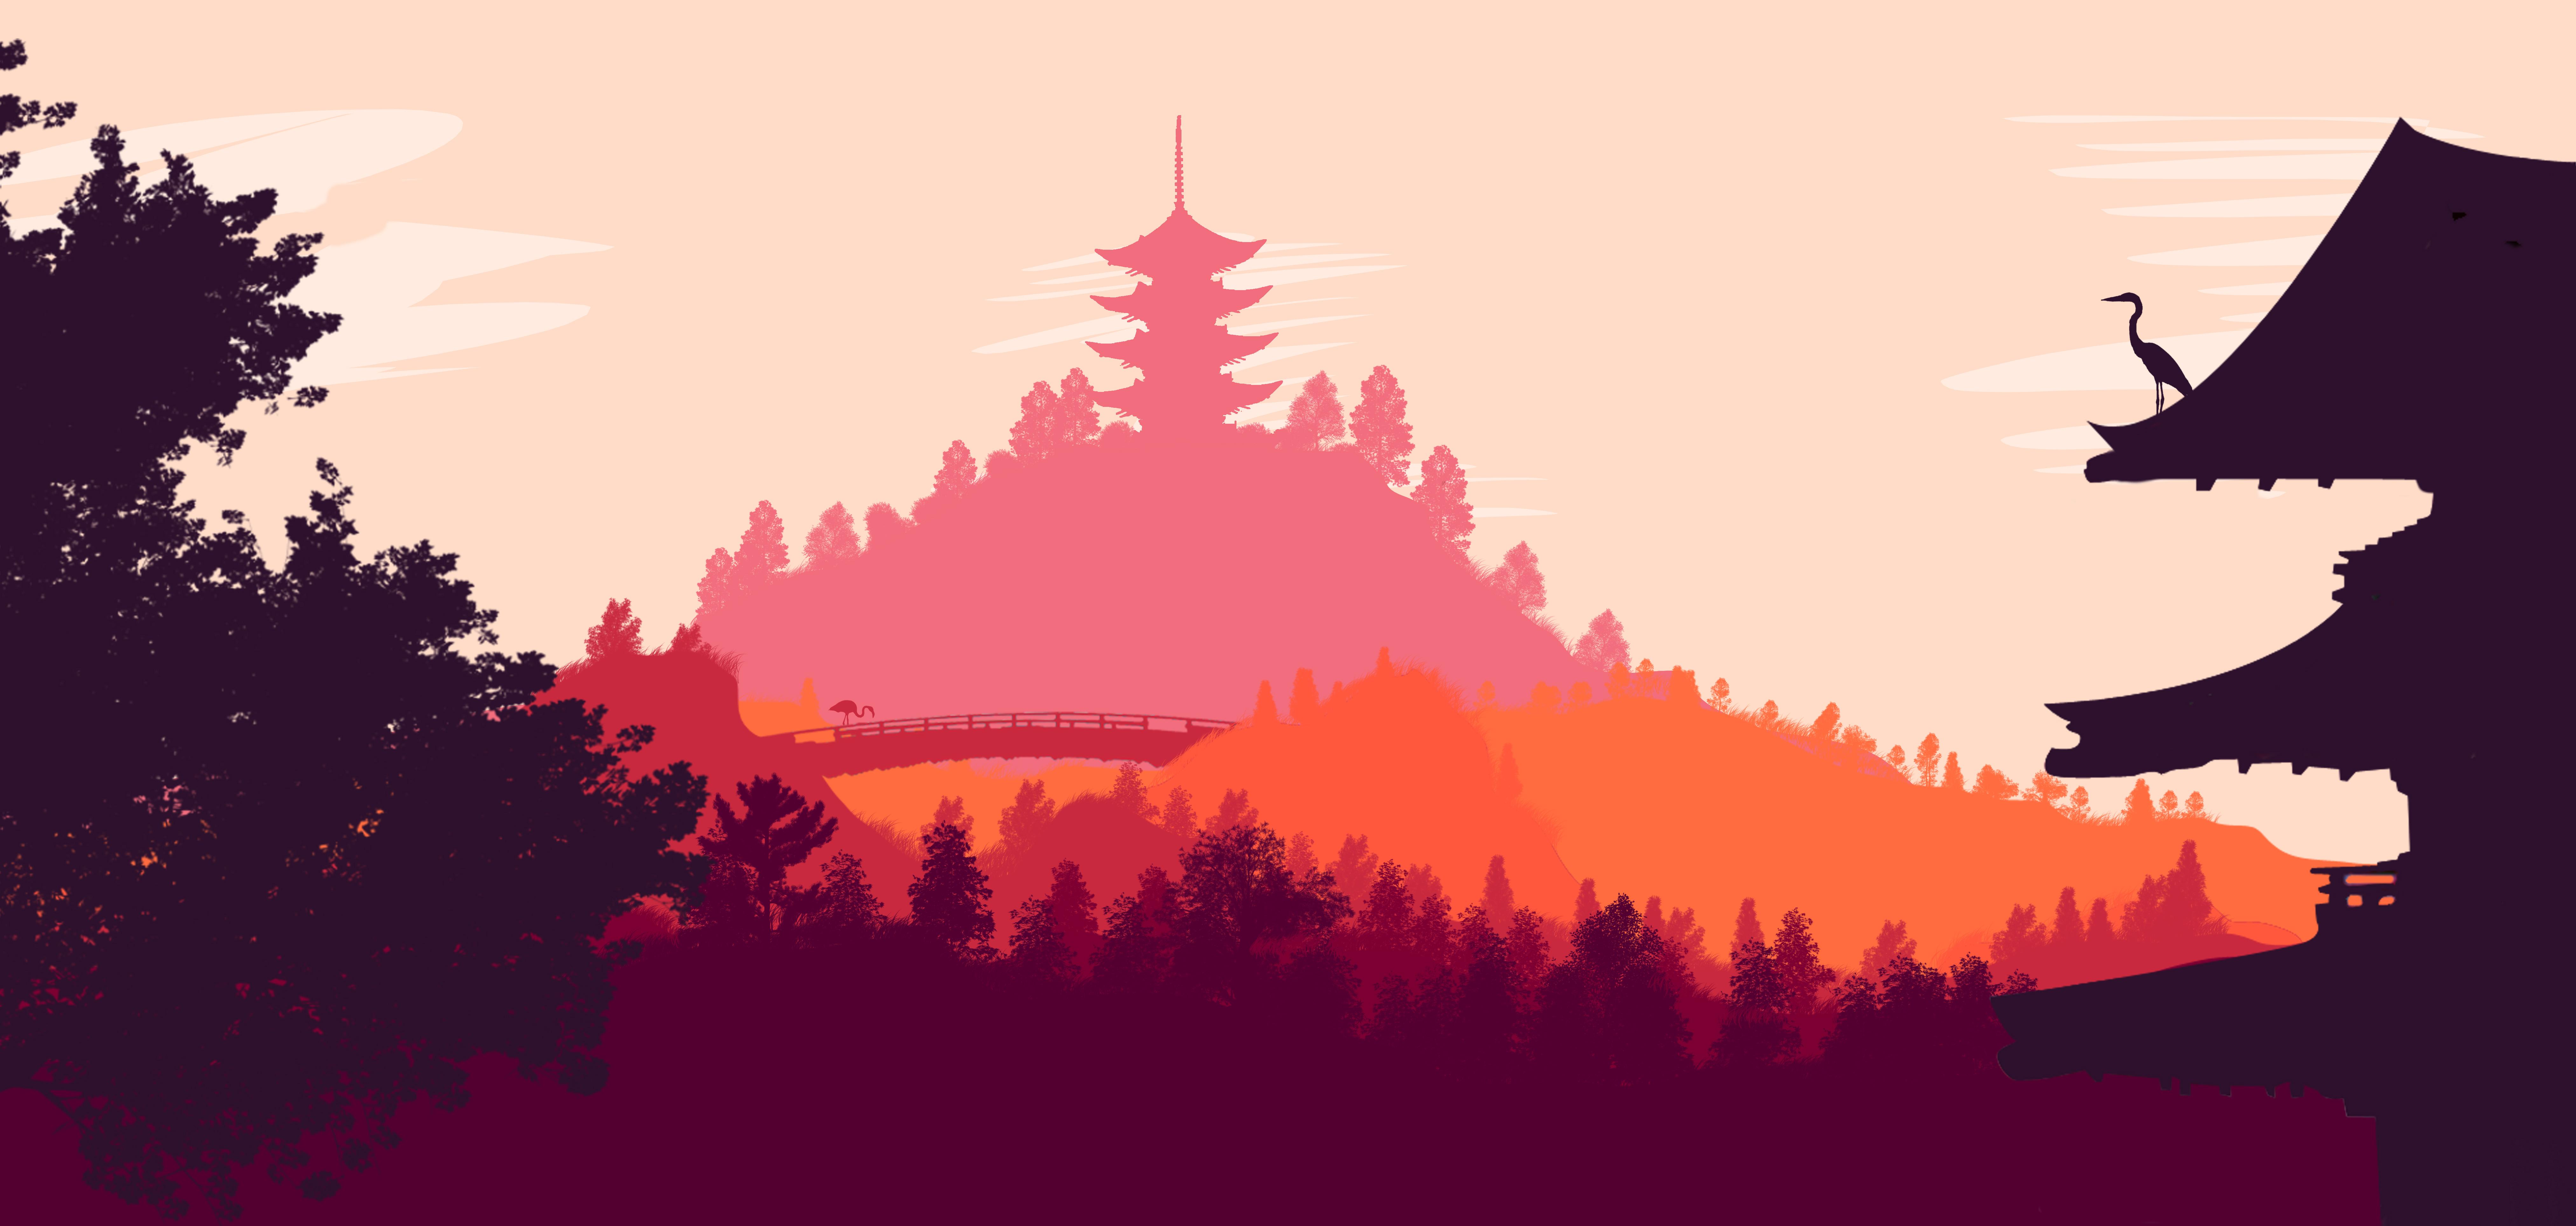 Japanese Landscape by Finnfanfoodle Japanese Landscape by Finnfanfoodle